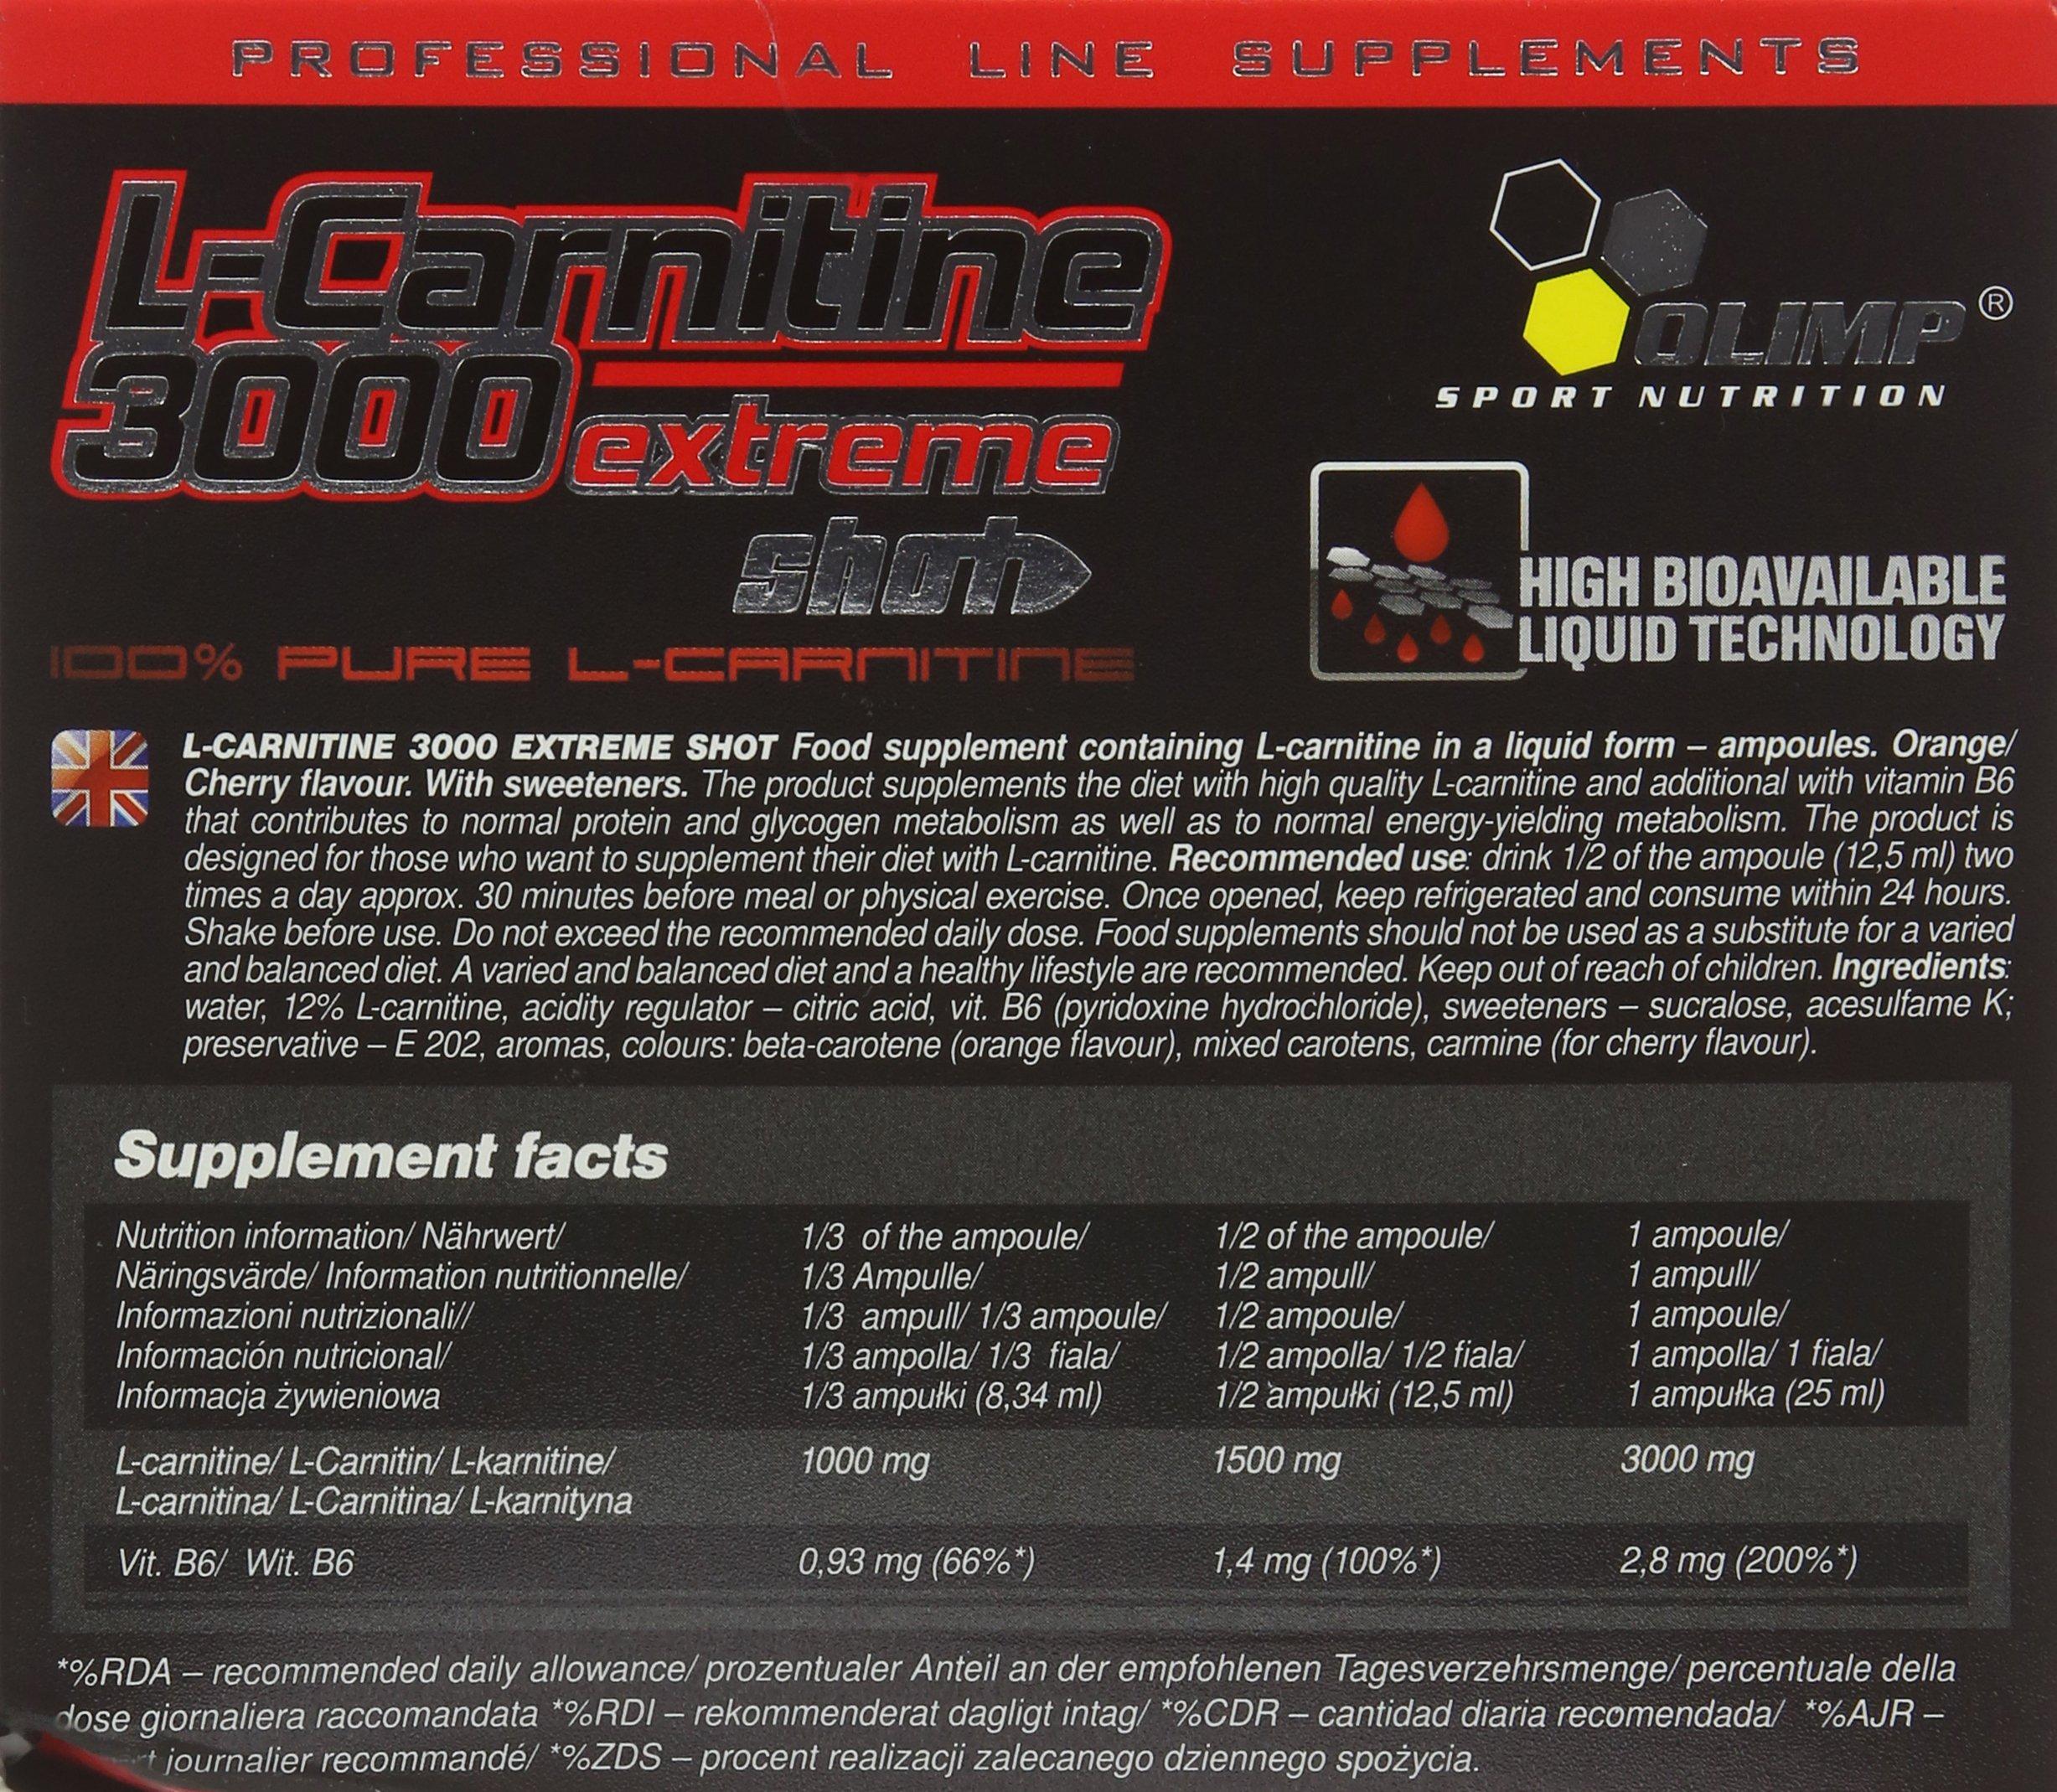 91DUy37FkcL - Olimp Orange 25ml L-Carnitine Forte 3000 Extreme Shot - Pack of 20 Shots